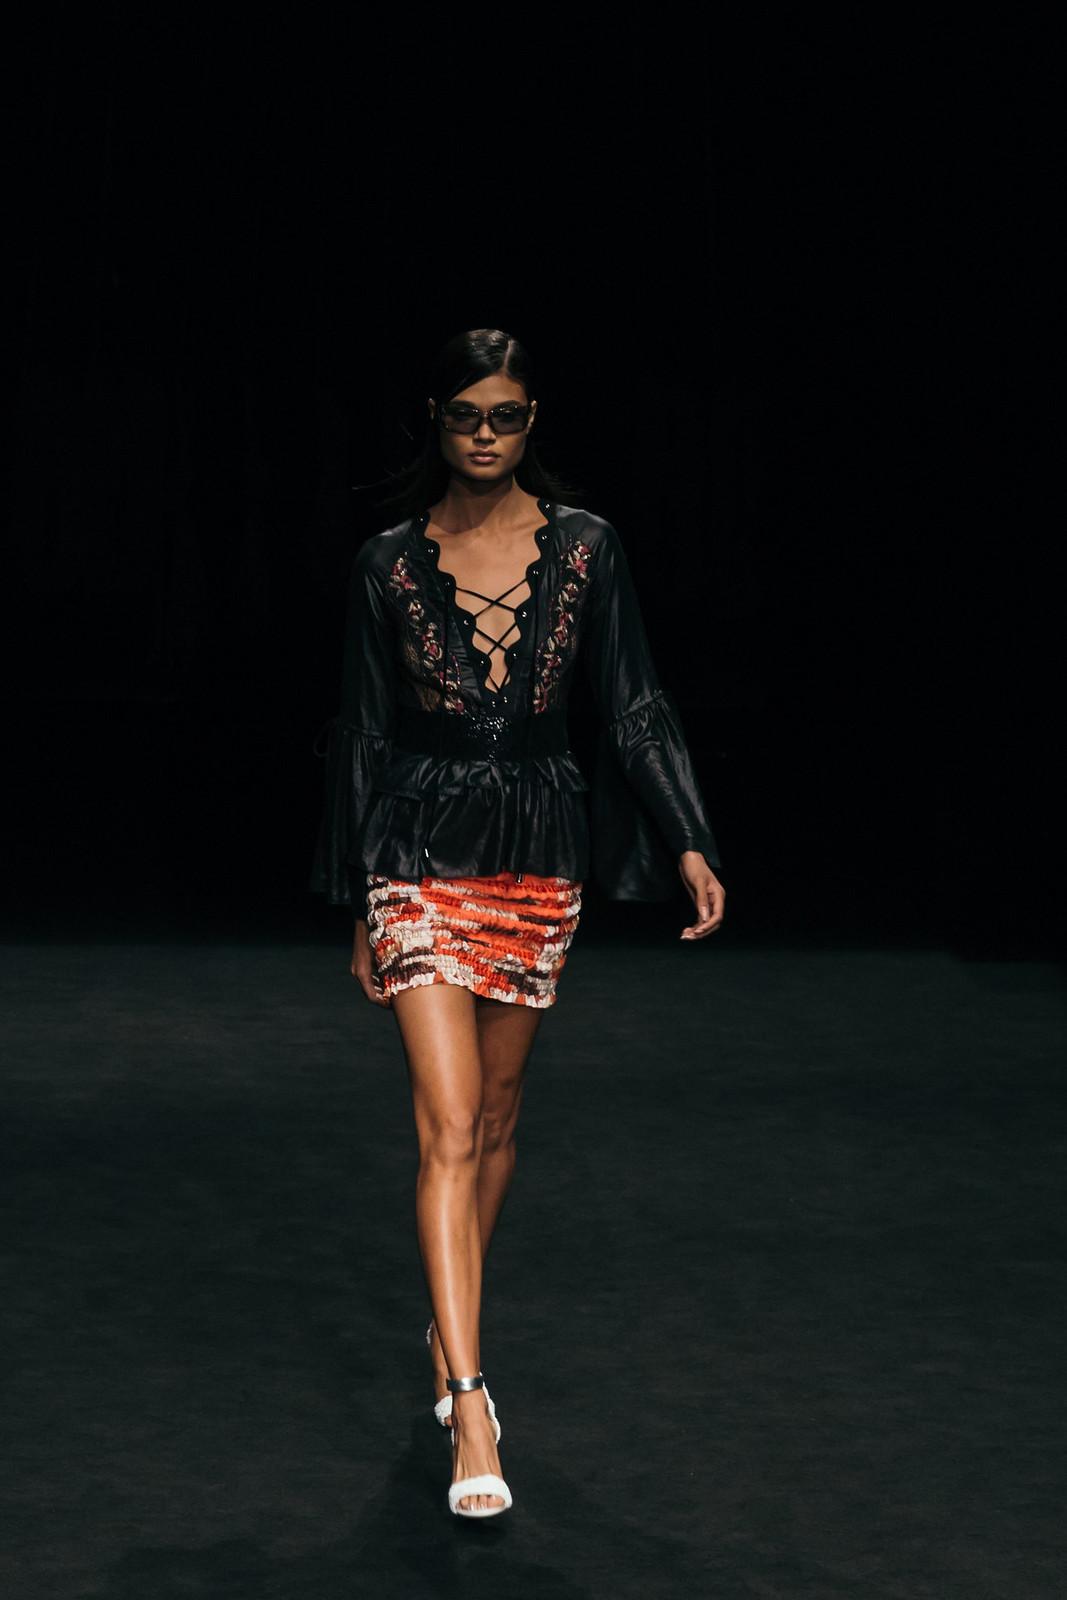 Jessie Chanes - Seams for a desire - 080 Bacelona Fashion #080bcnfasion -15